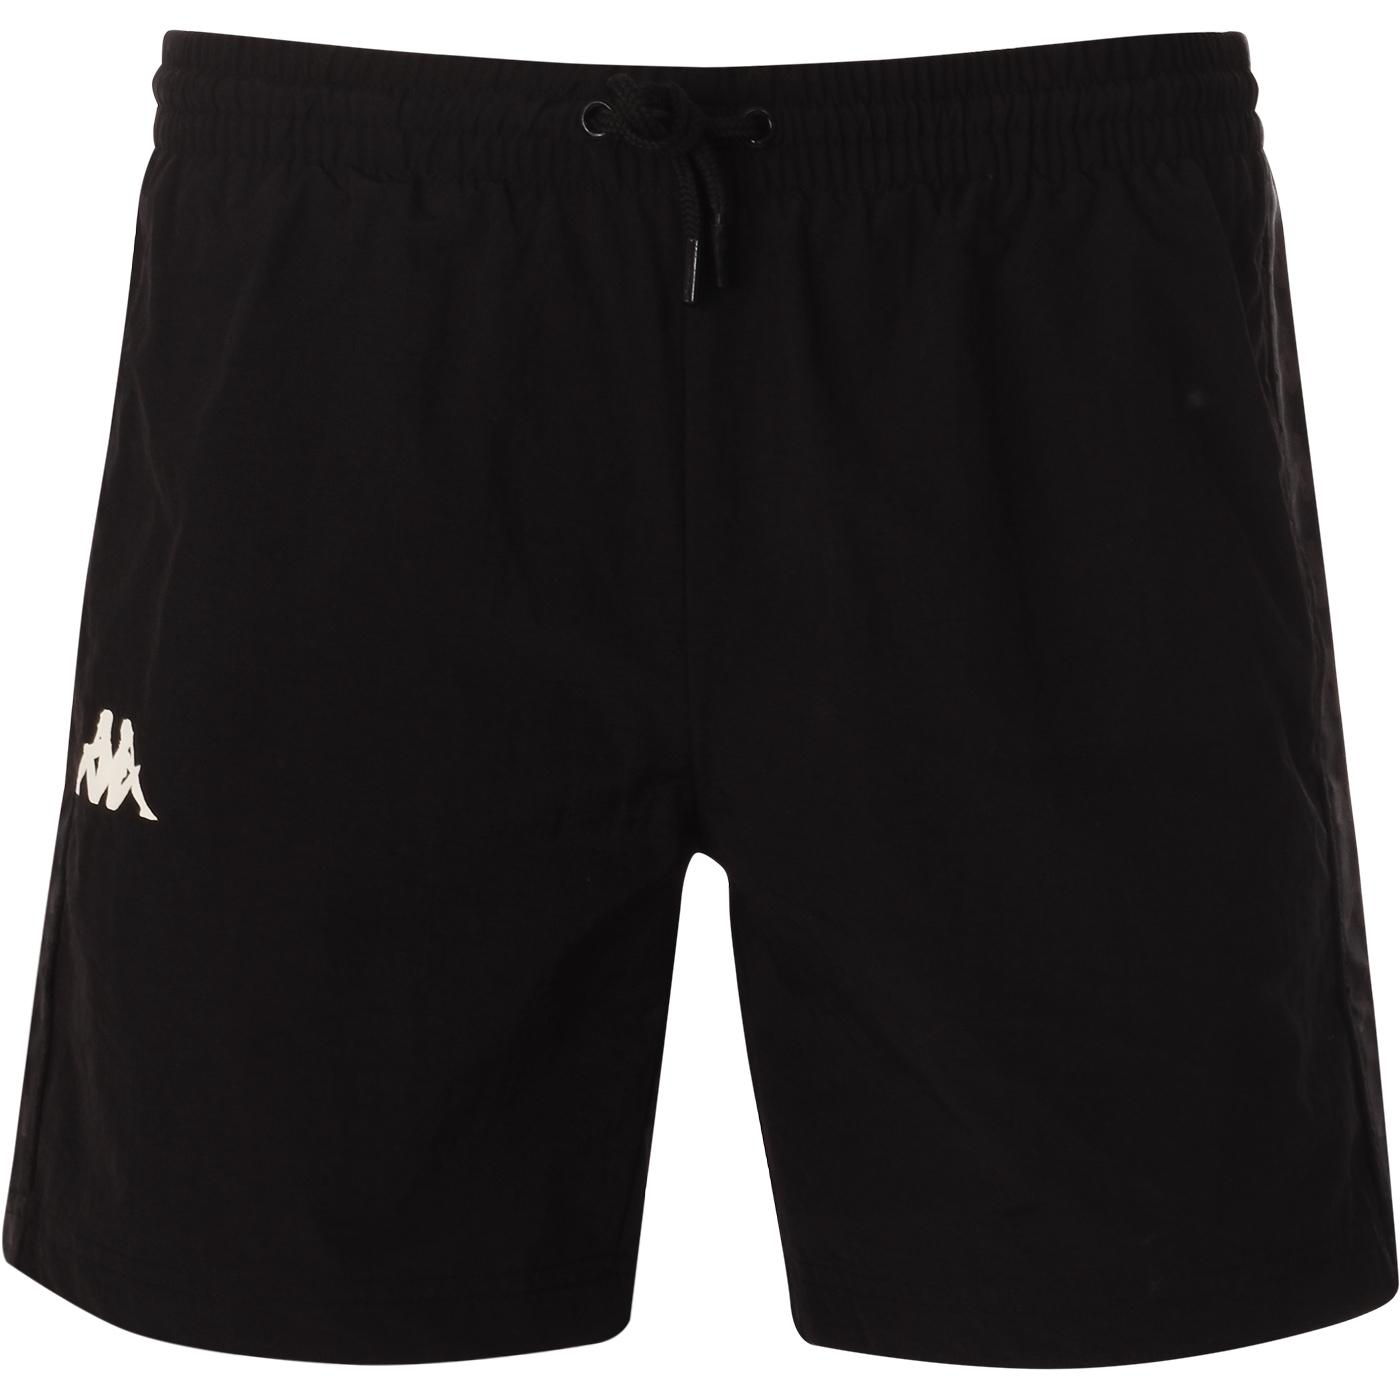 Coney KAPPA 222 Banda Swim Shorts (Black/White)